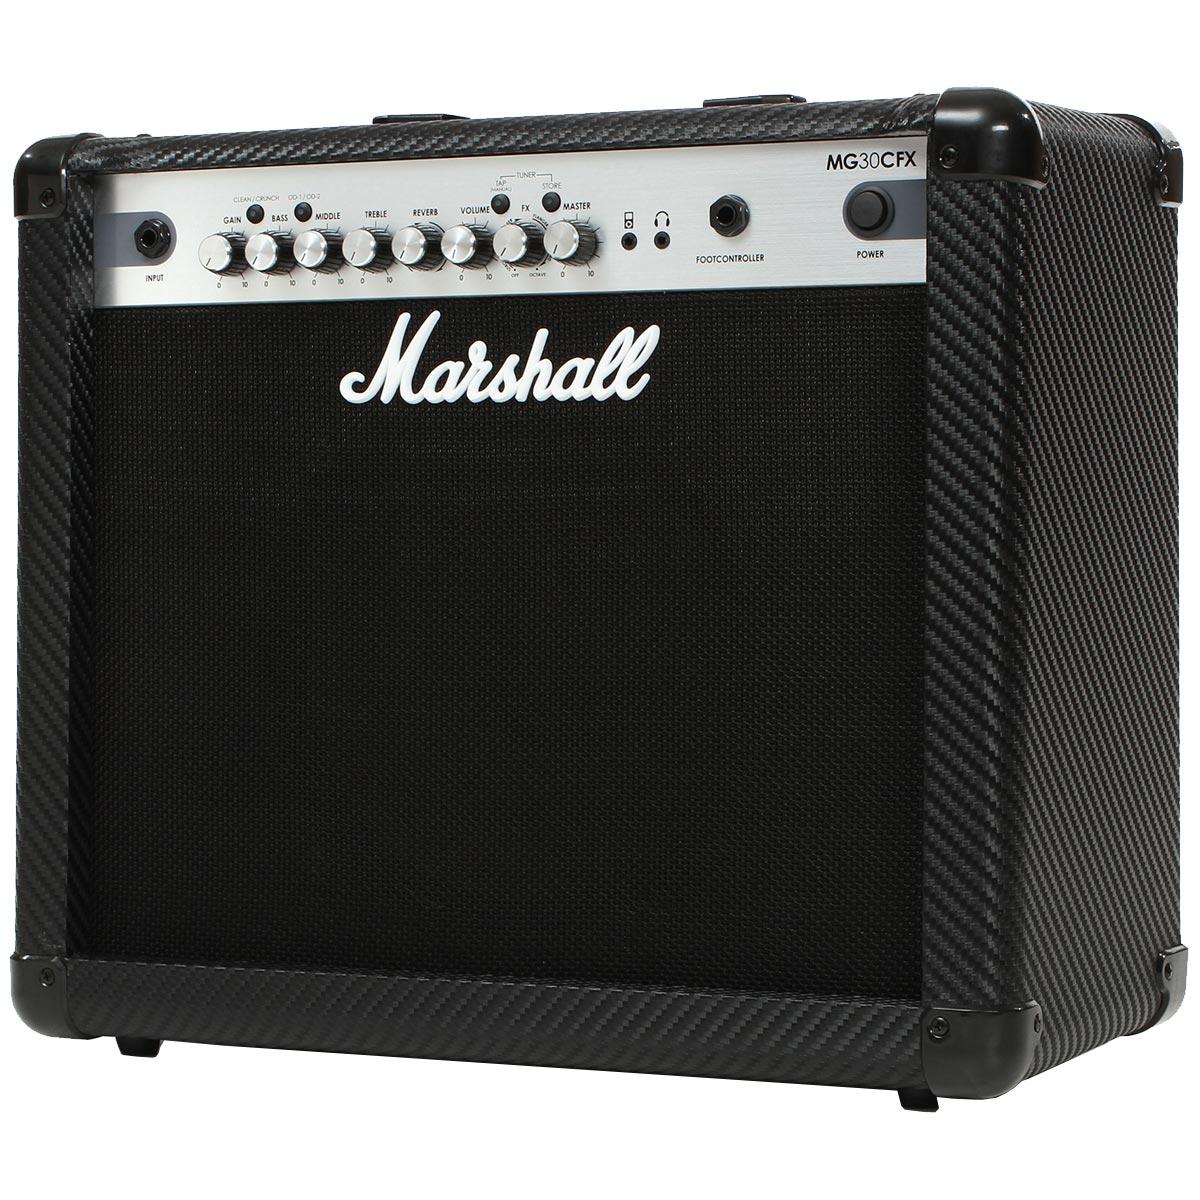 Amplificador Combo p/ Guitarra 30W Carbon Fibre MG30CFX - Marshall